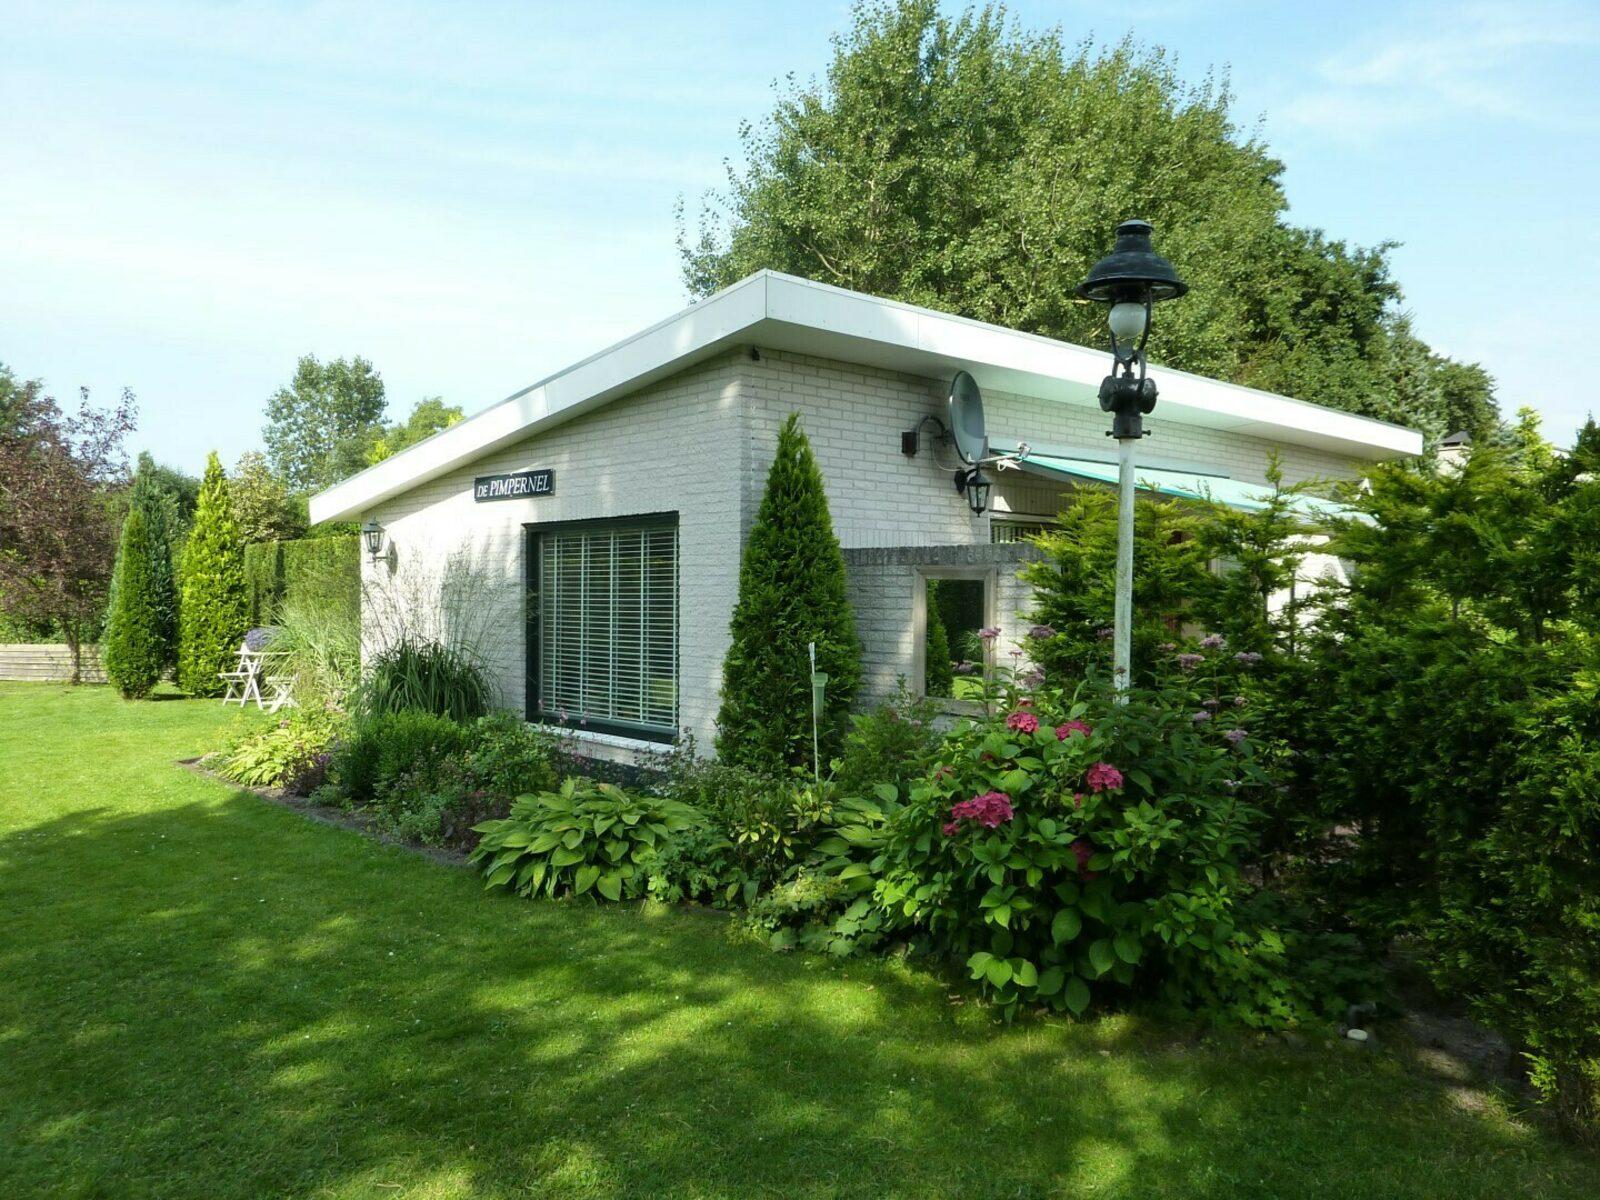 Prinsenhof 21 - Ouddorp - Pimpernel